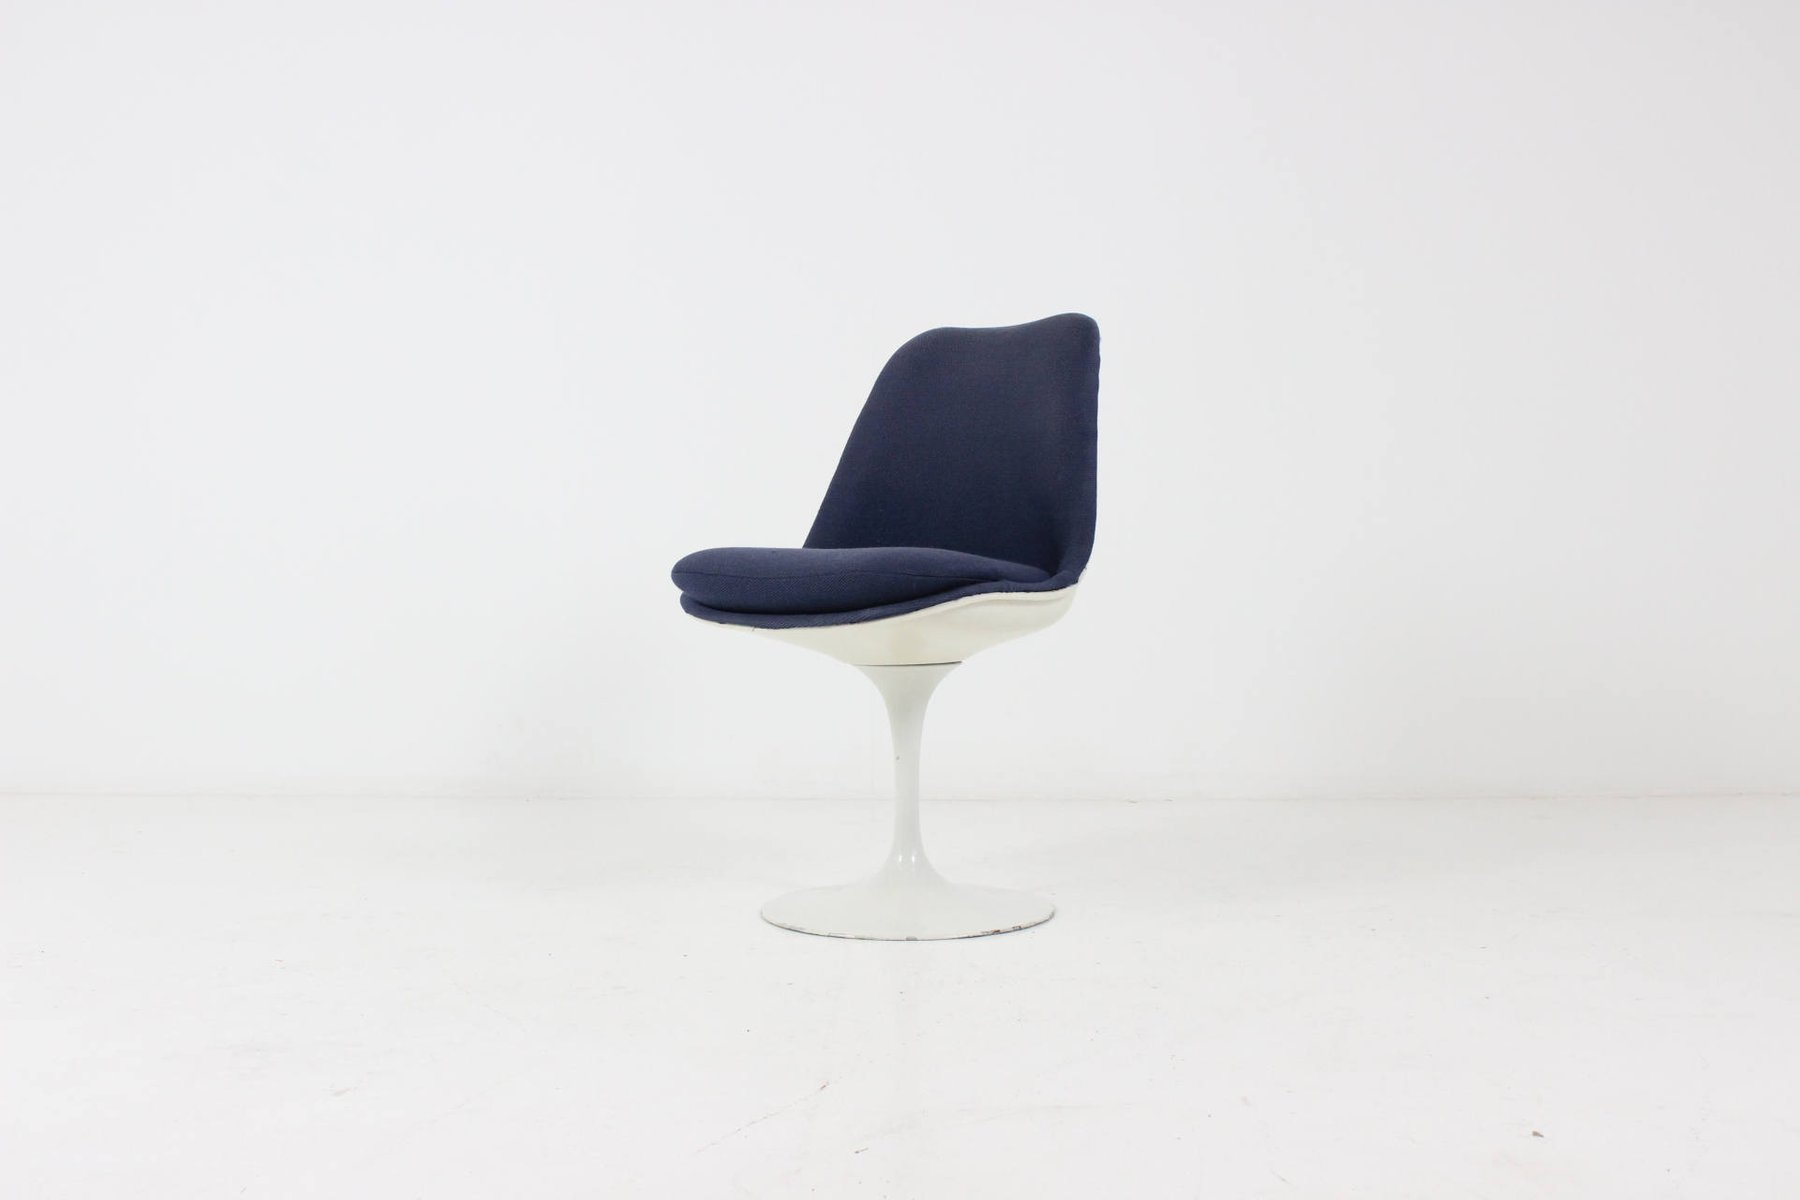 Tavolo Saarinen Usato : Sedie knoll usate arredamento scandinavo blog arredamento